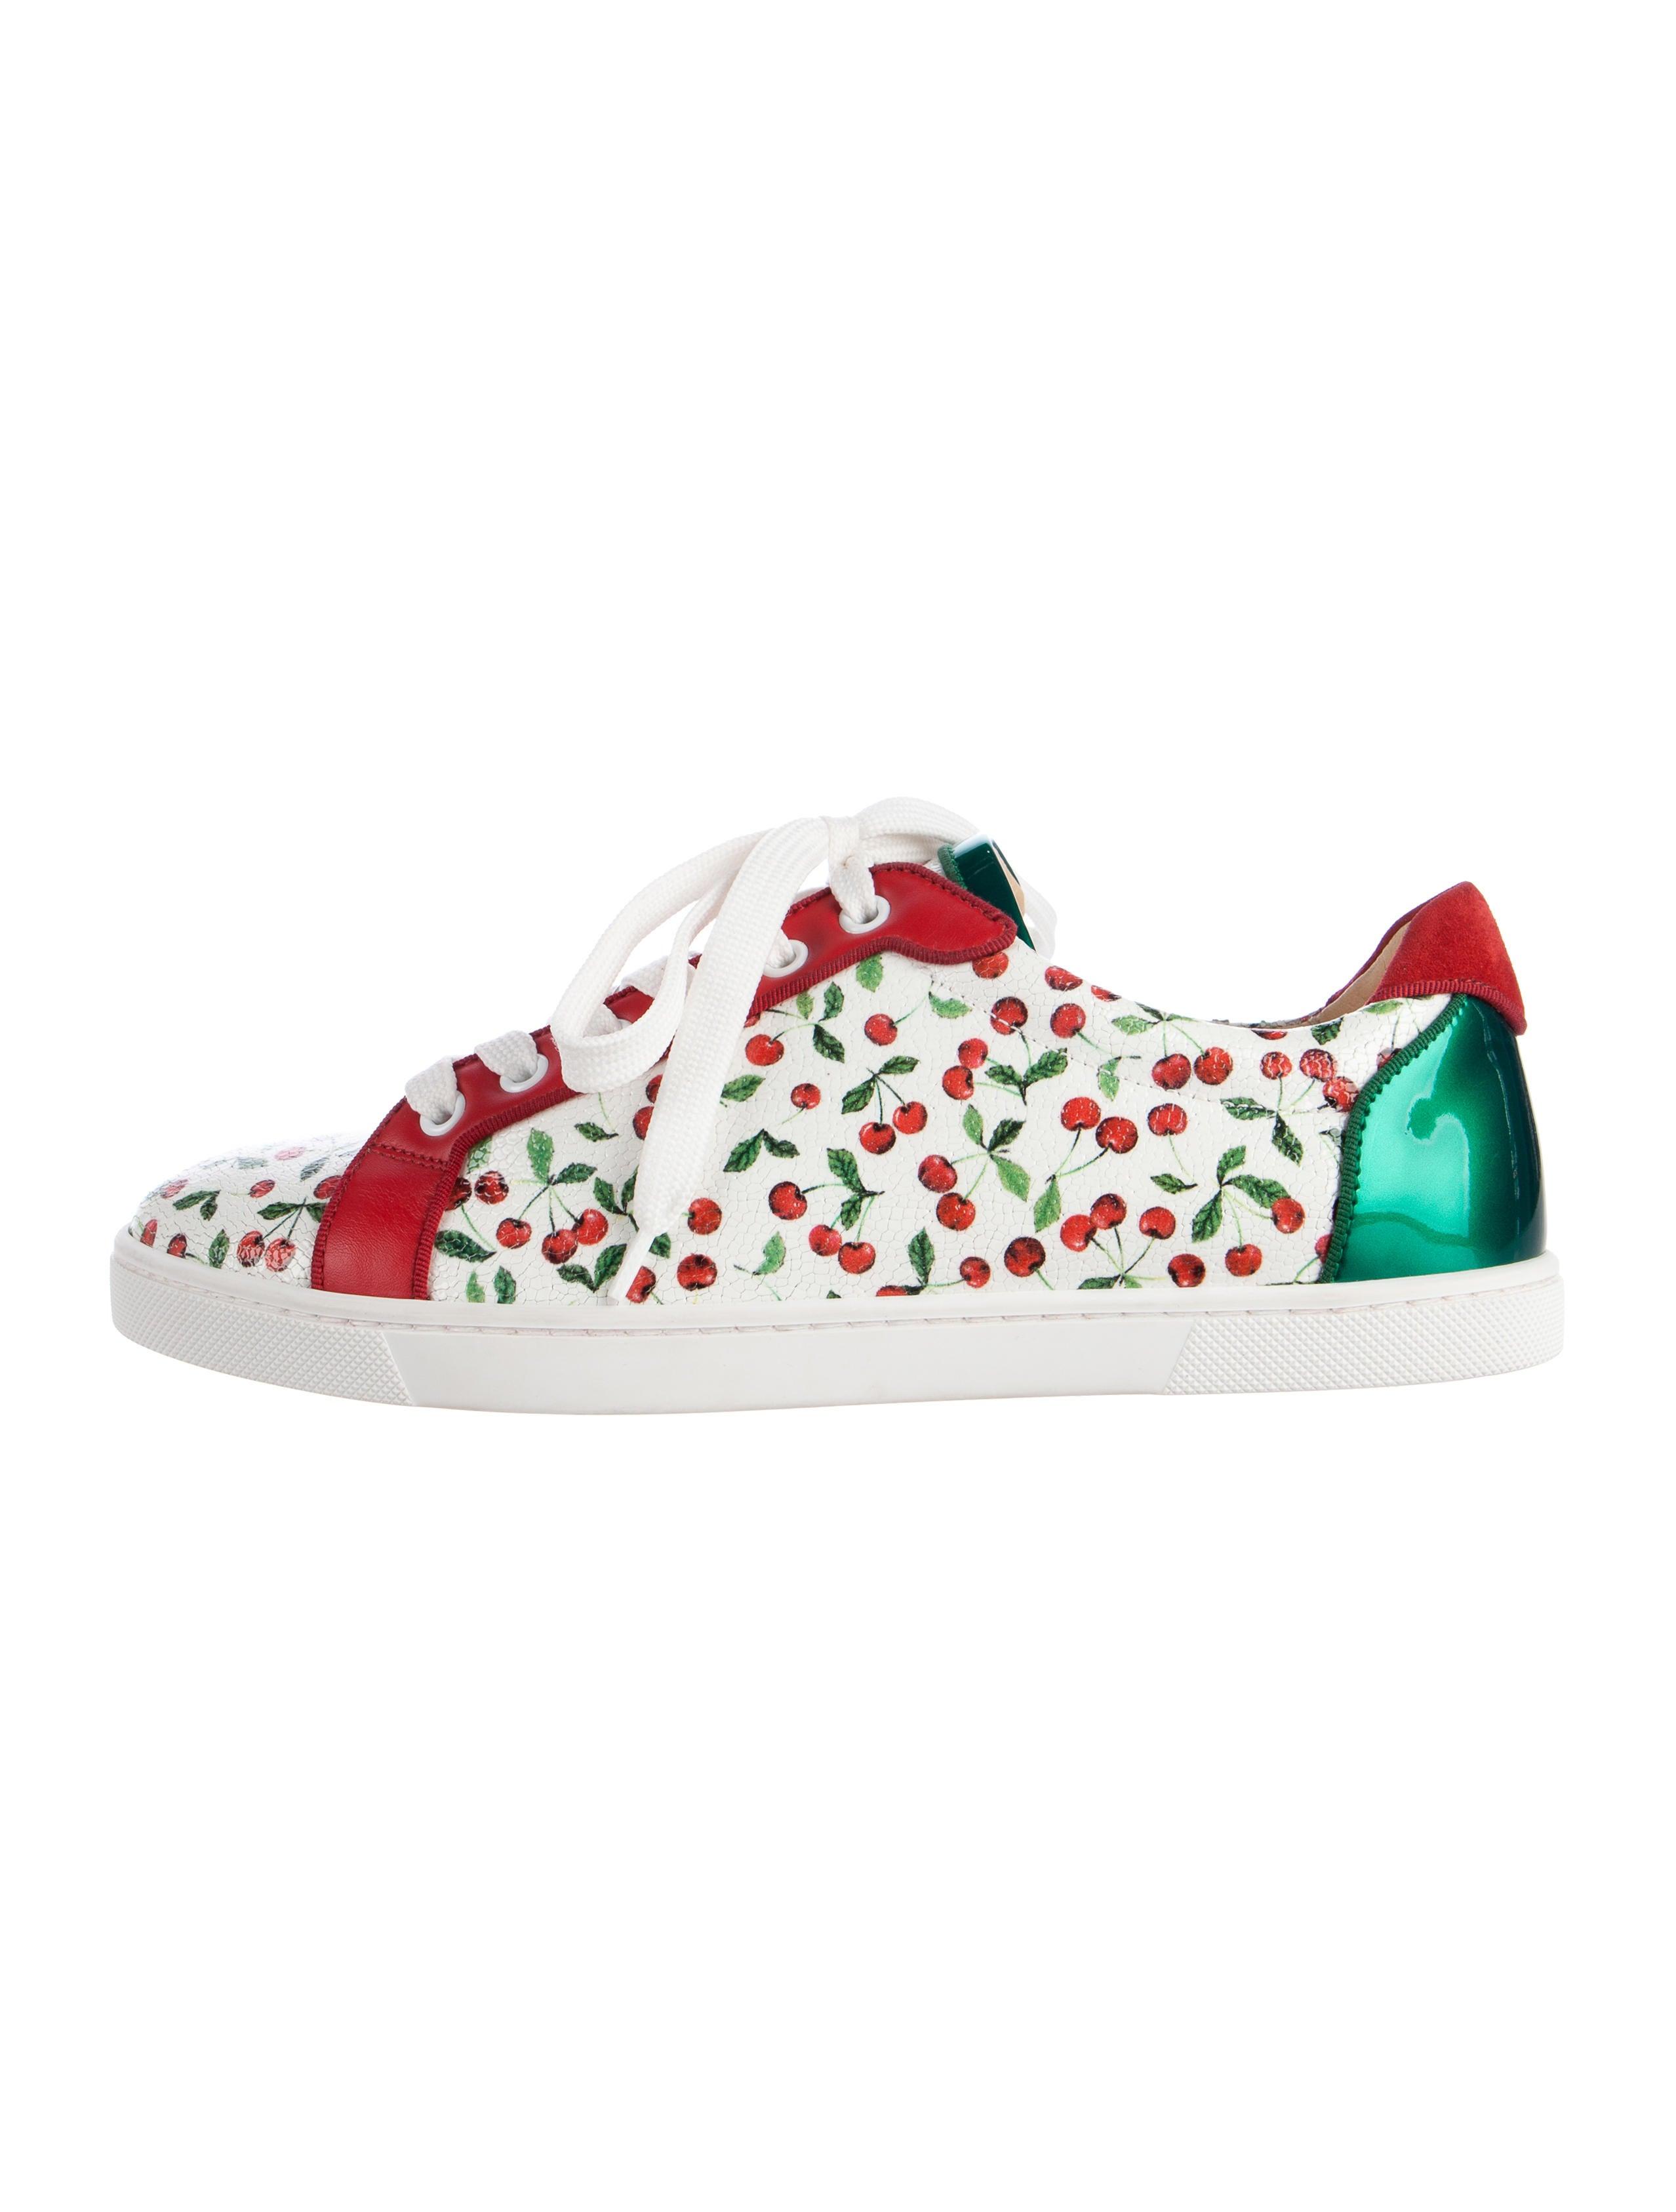 295e6b97c95 Christian Louboutin Seava Leather Low-Top Sneakers - Shoes ...